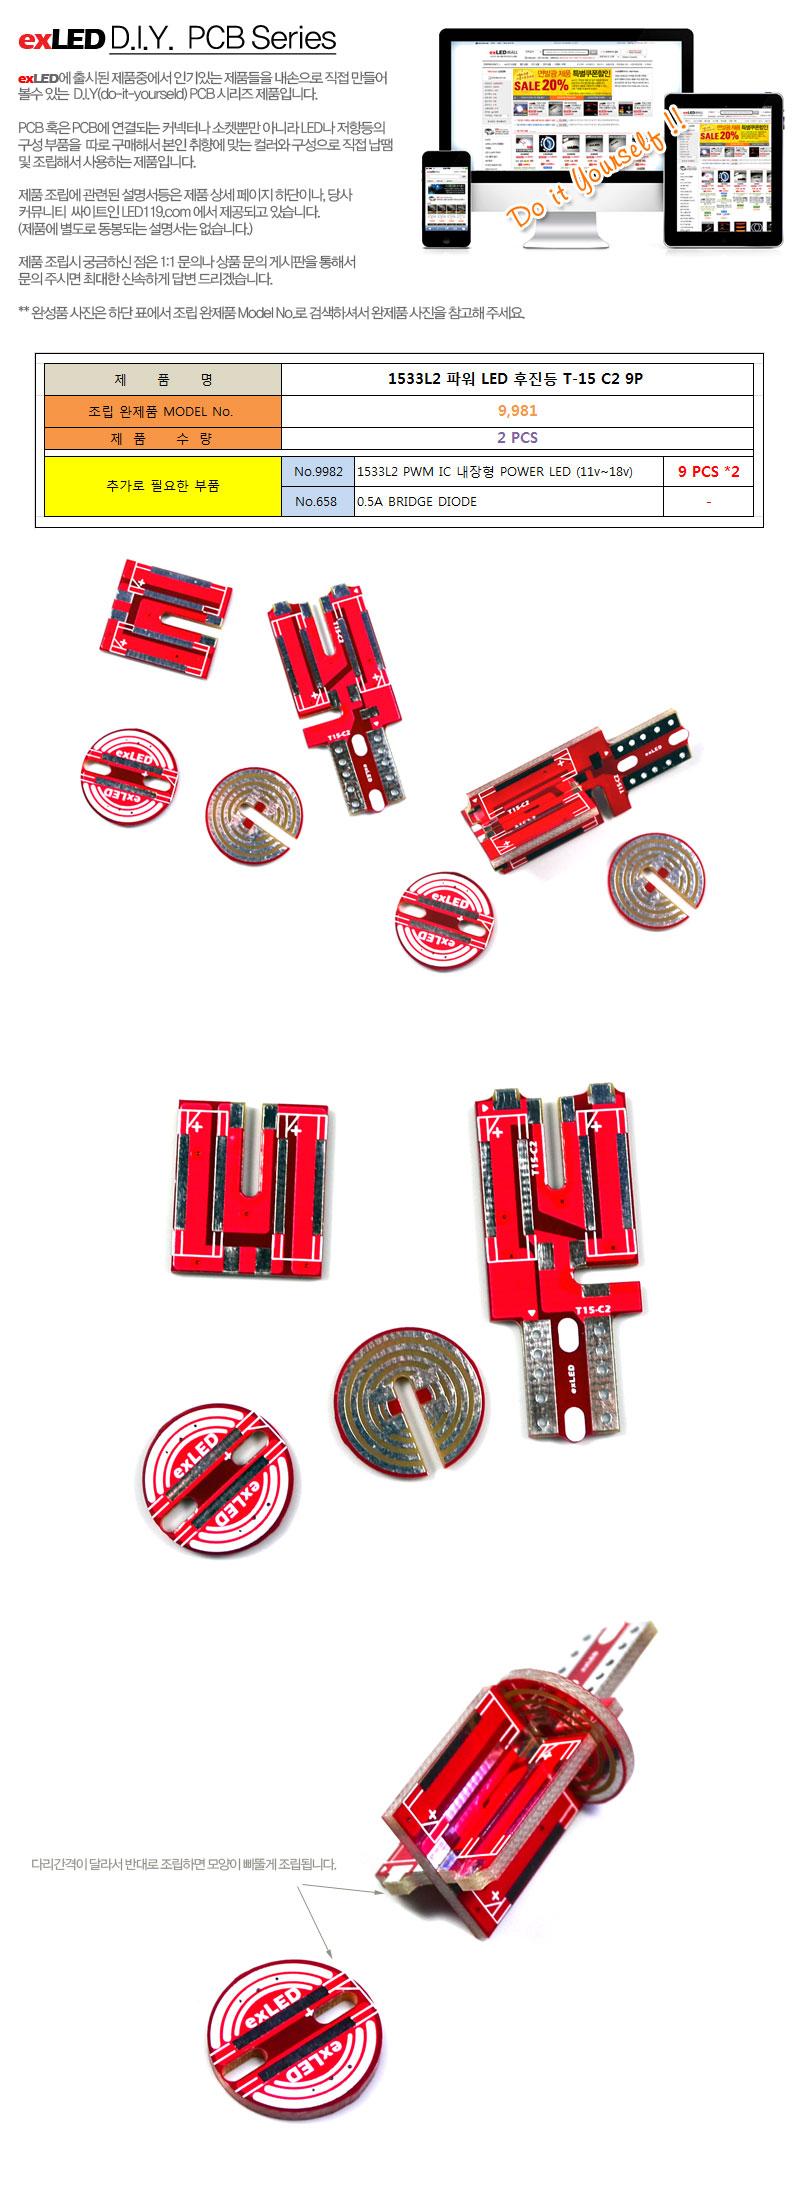 exLED DIY PCB - 1533L2파워LED용 후진등 T-15 C2 9P  (2PCS)